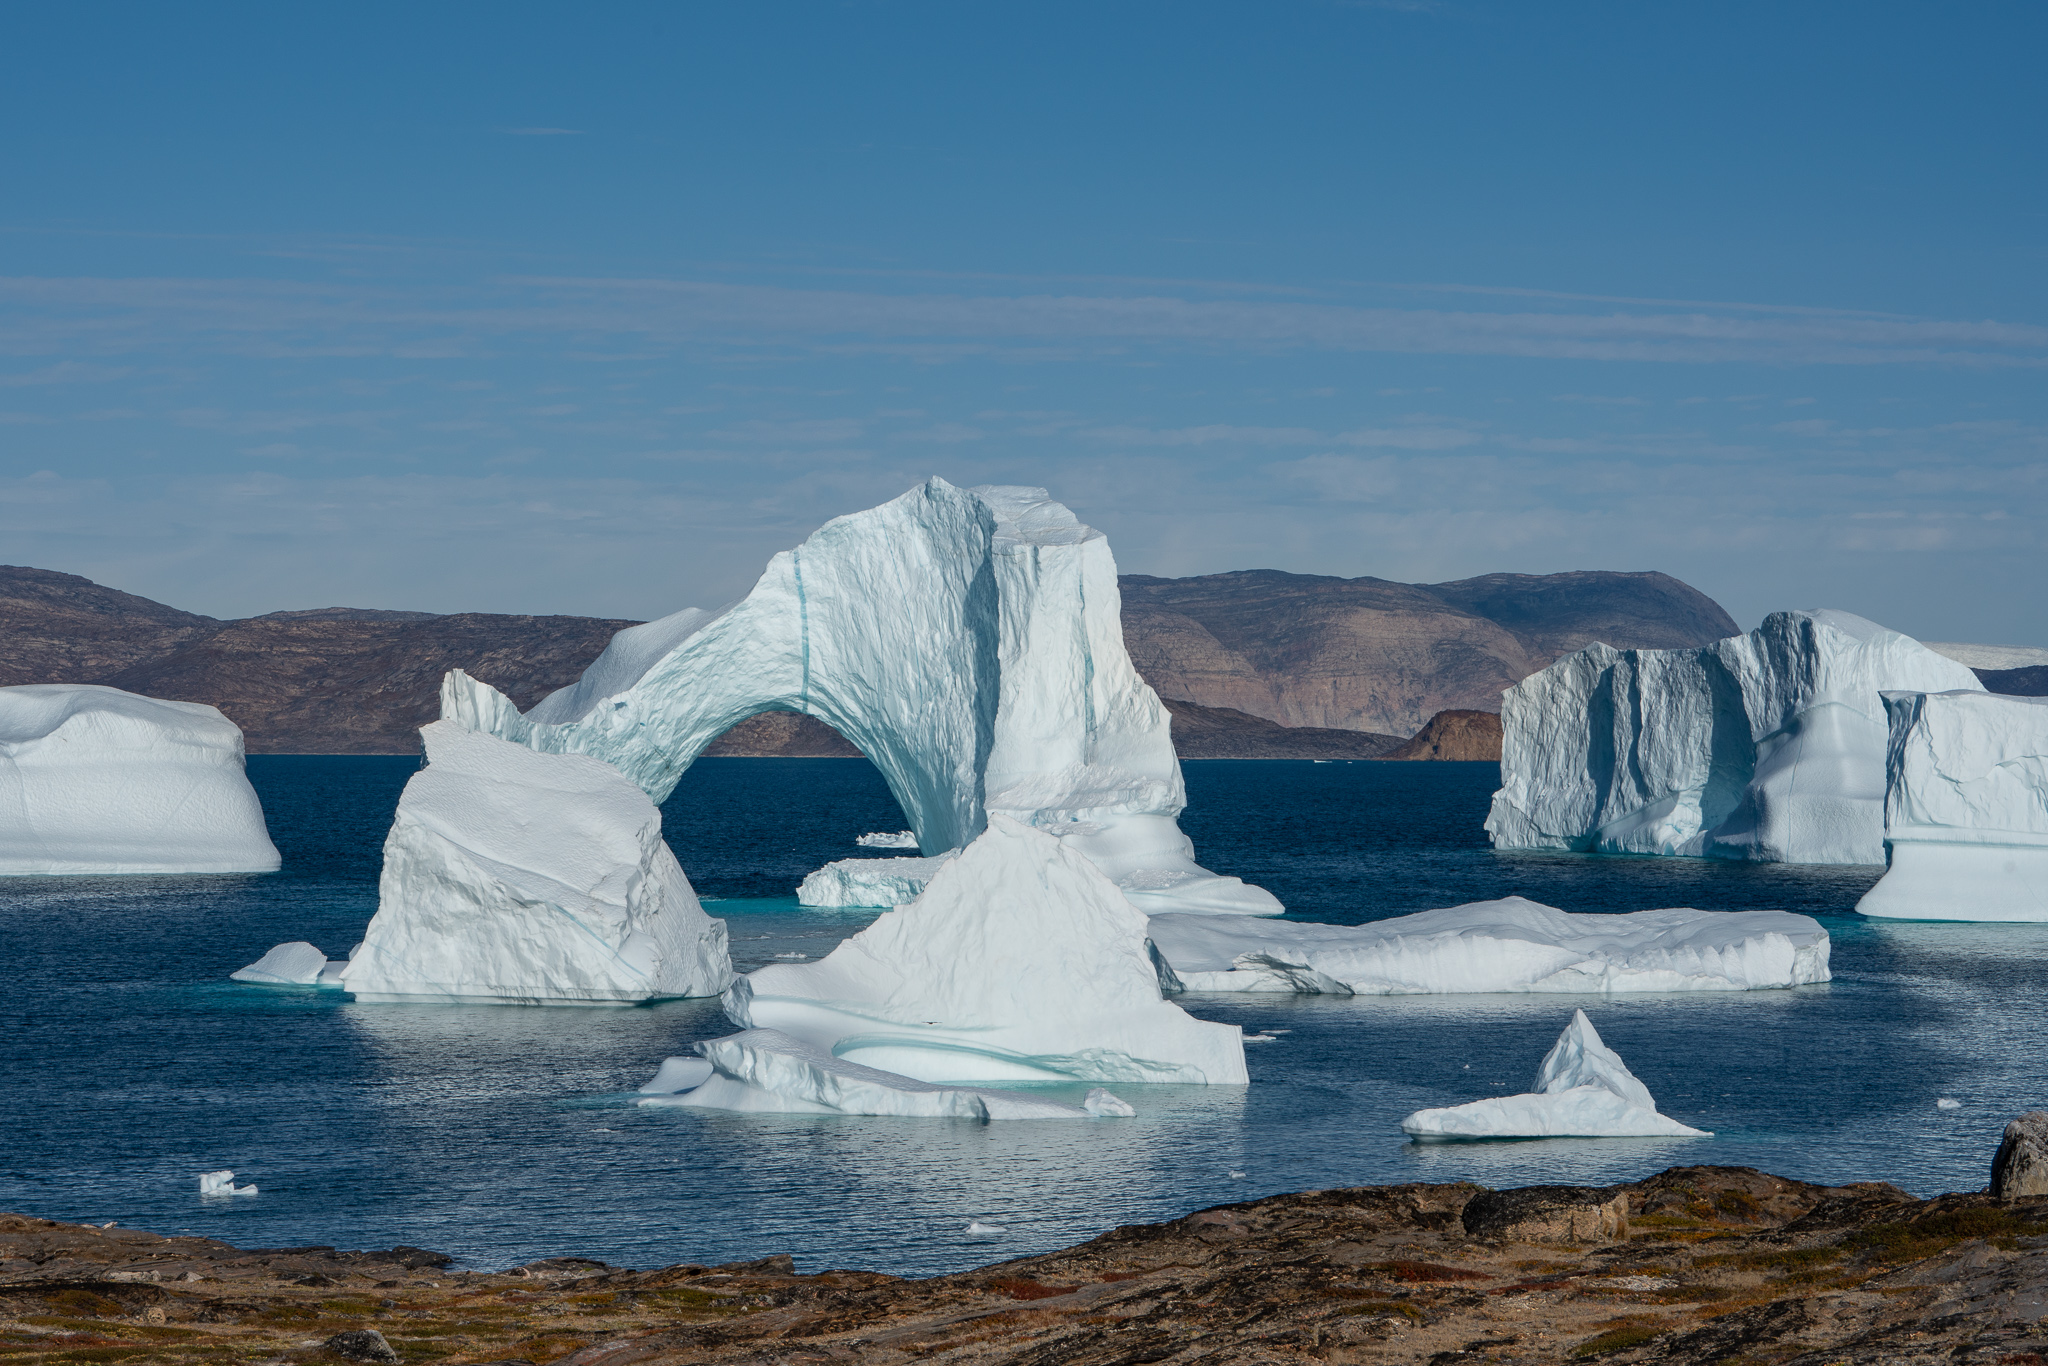 Baffin Bay - 2019